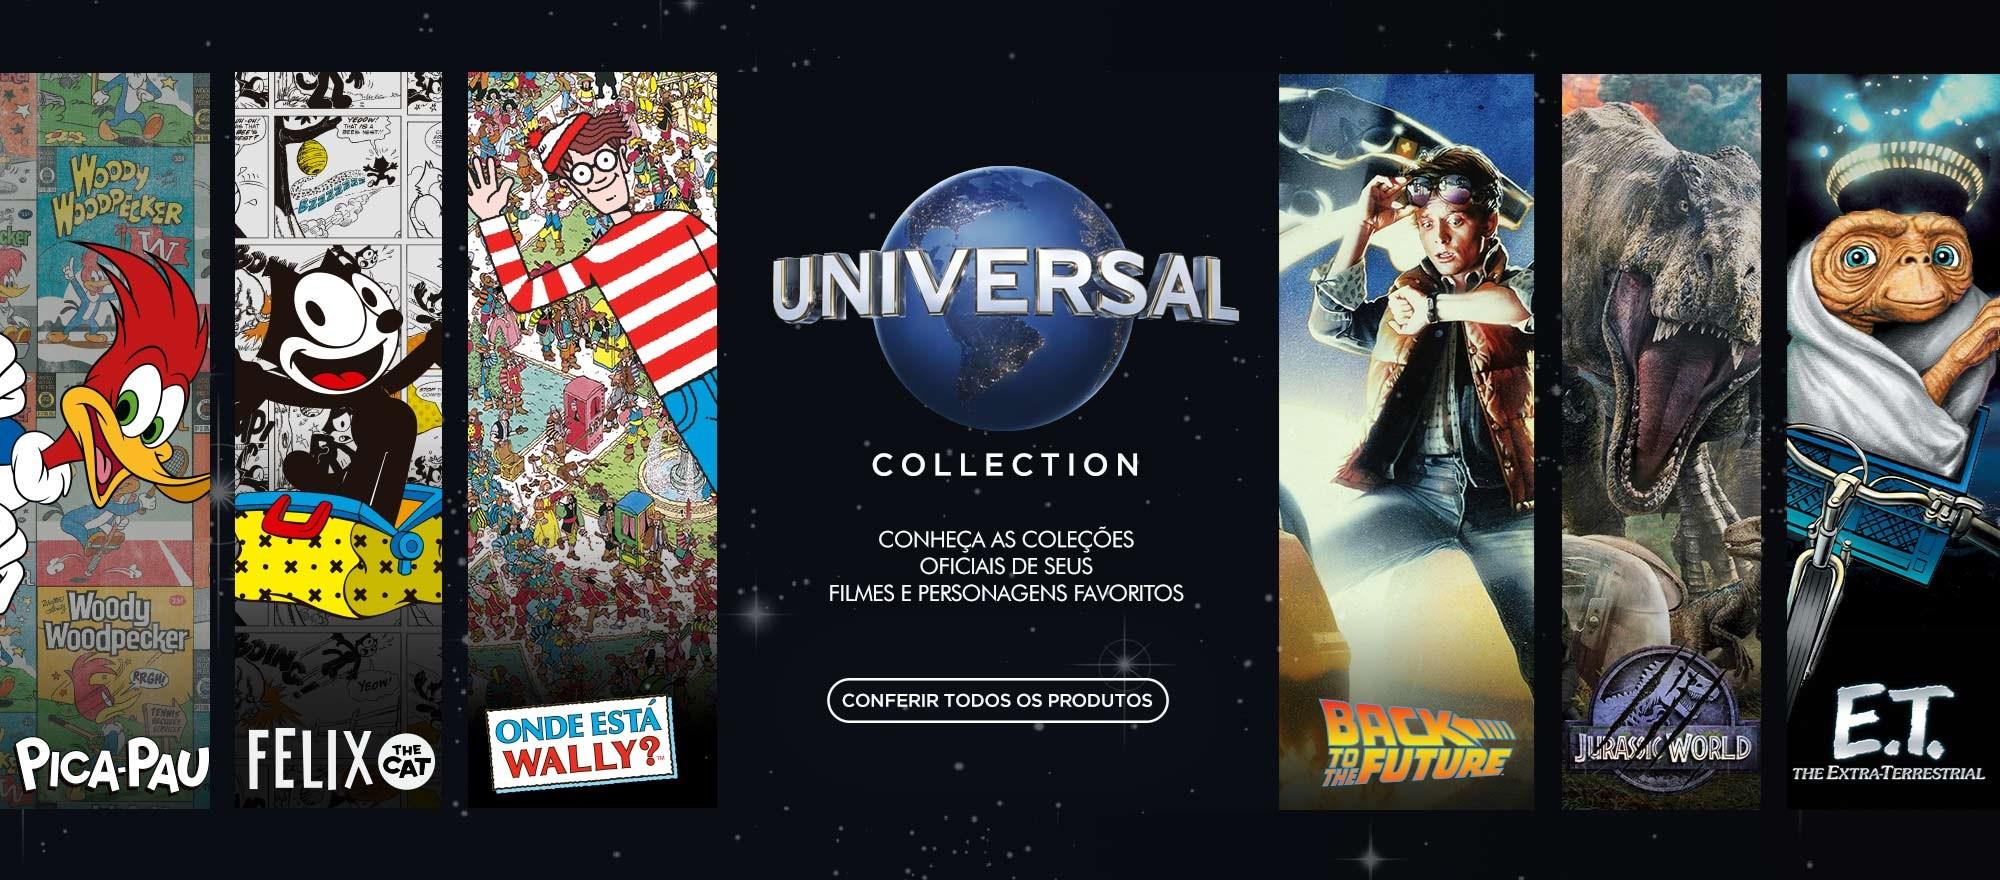 Universal Studios Oficial